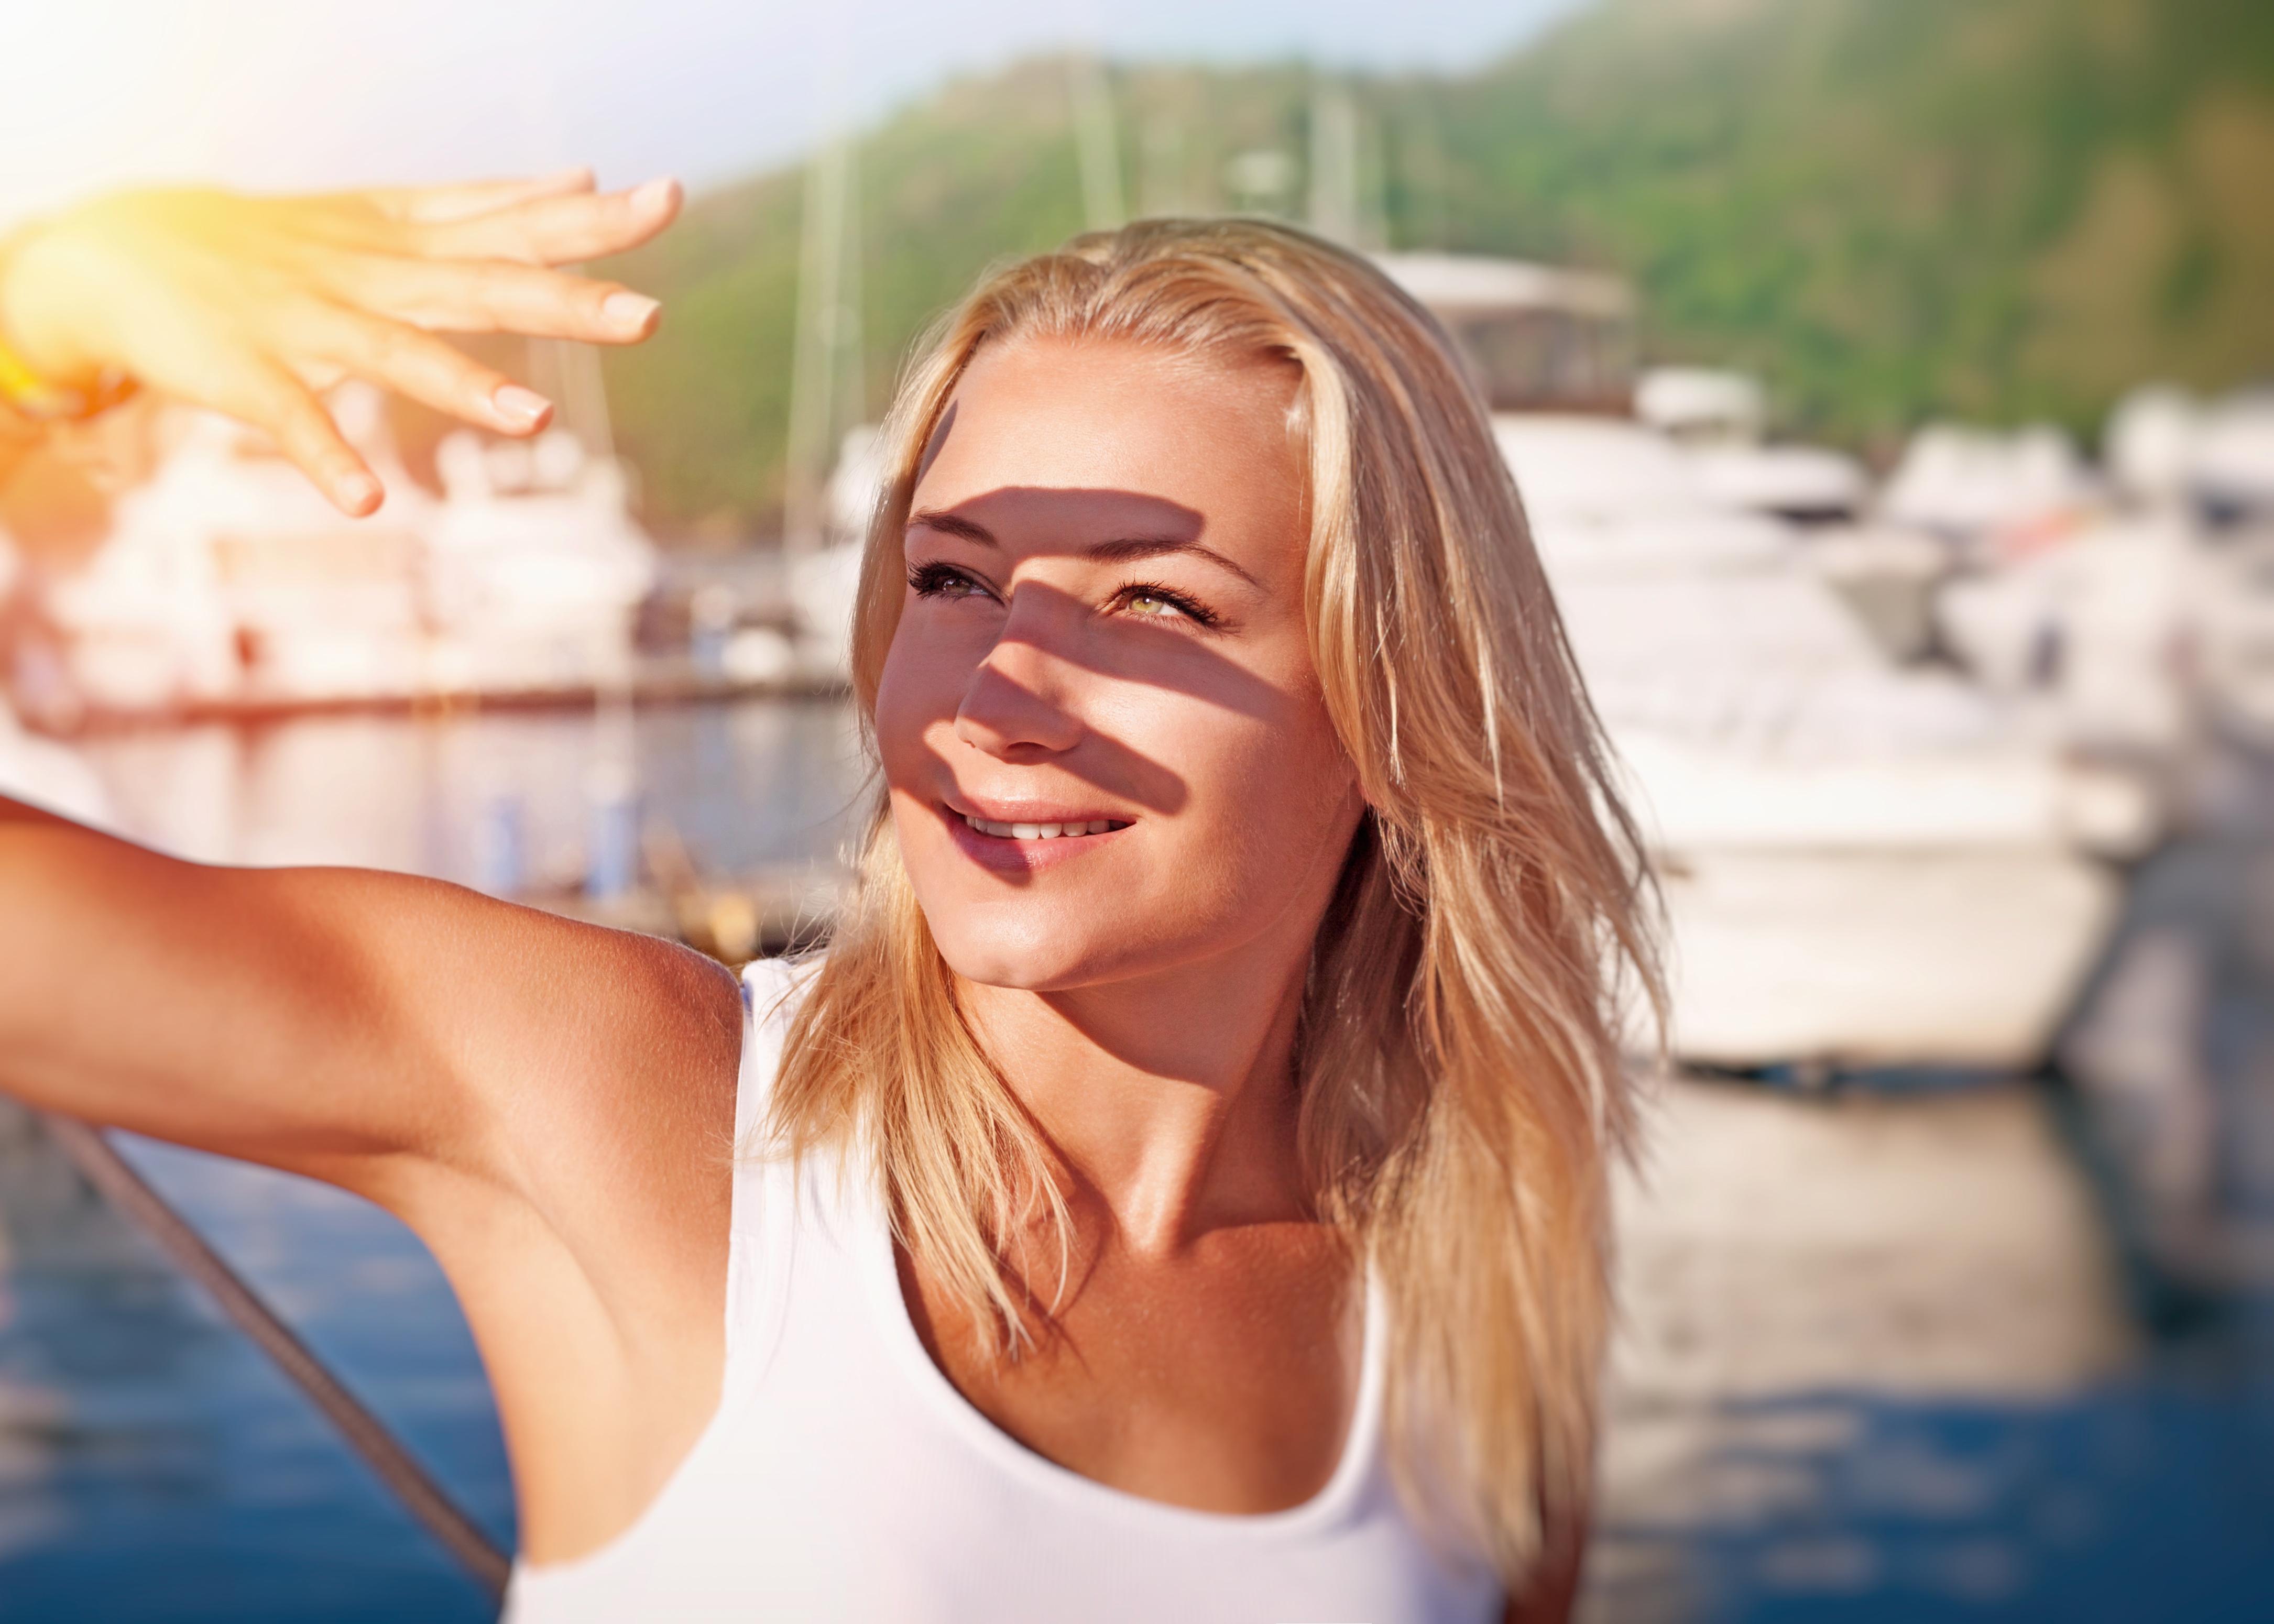 shielding eyes from sun -- eye health